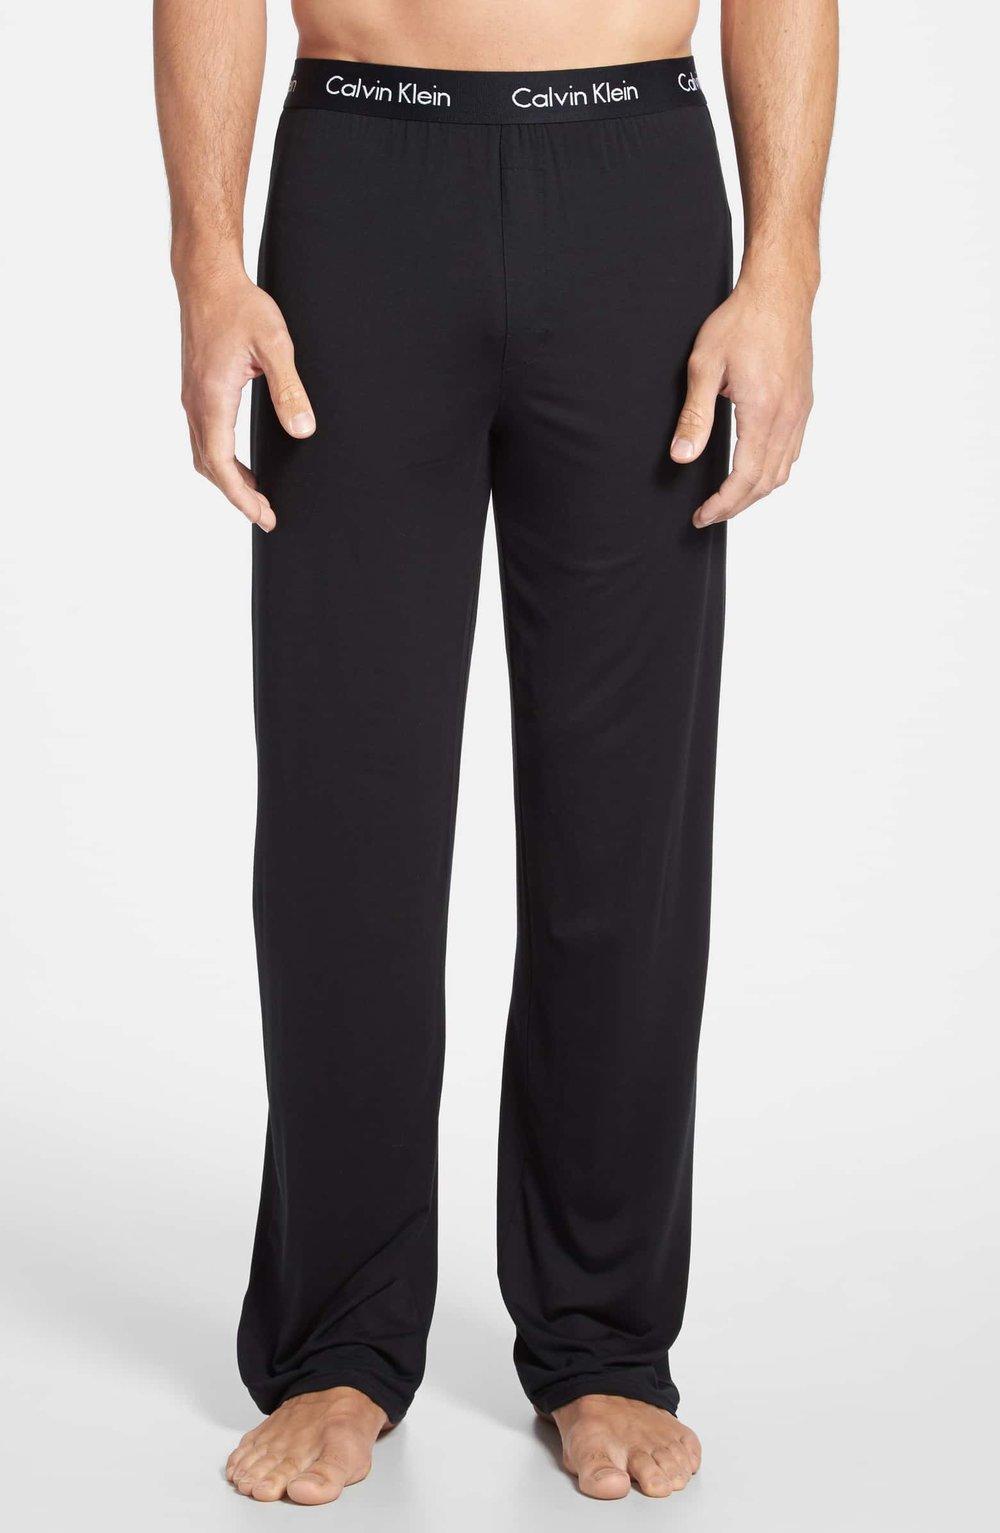 Calvin Klein Lounge Pants - $32 on Nordstrom